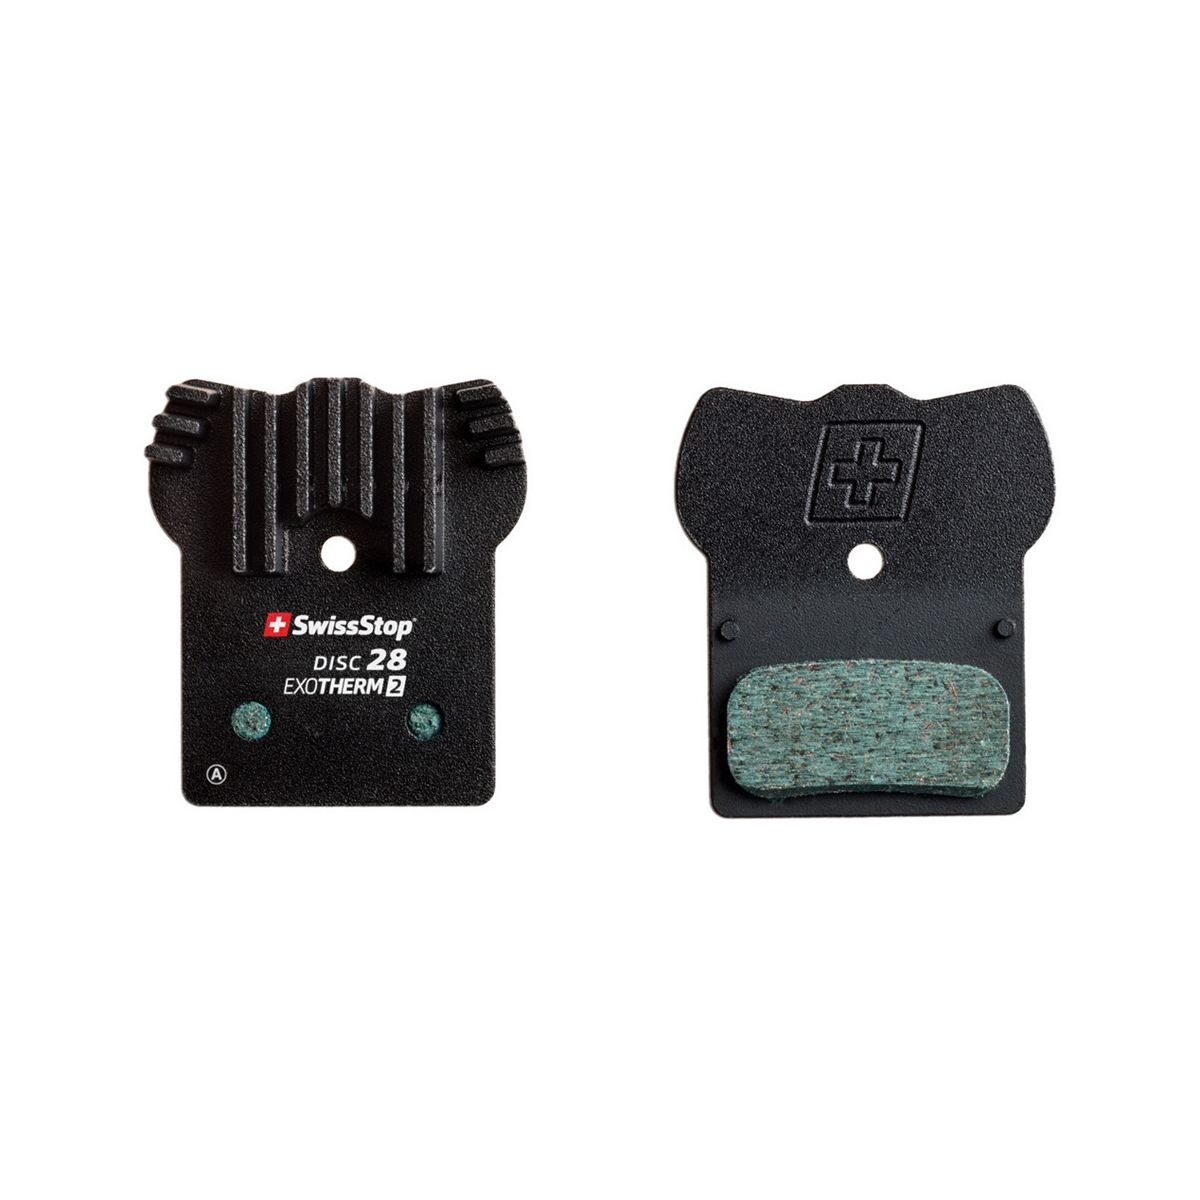 Disc Brake Pads Pair Disc 28 EXOTherm2 Organic Shimano XTR / XT / SLX / Deore, FSA, Rever